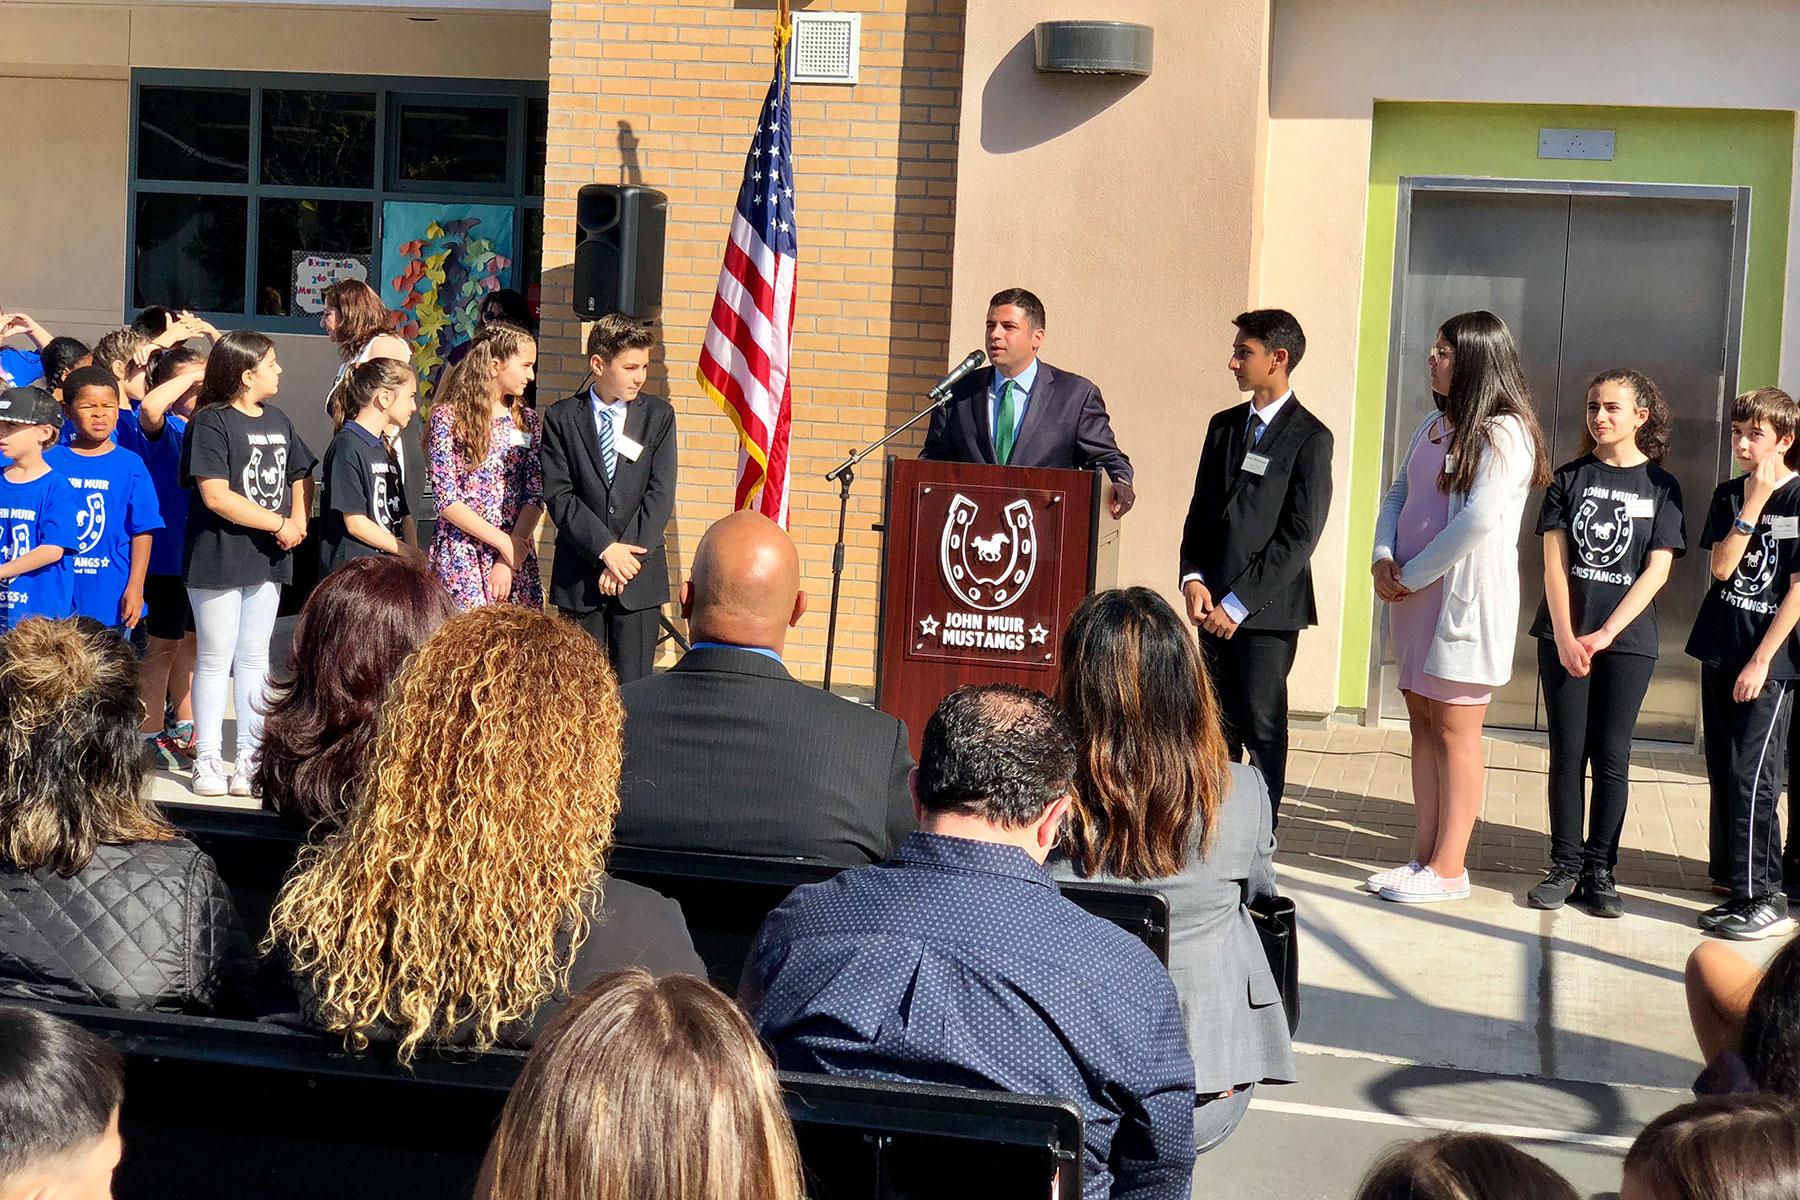 Muir Elementary School Measure S Ribbon Cutting Ceremony April 2018